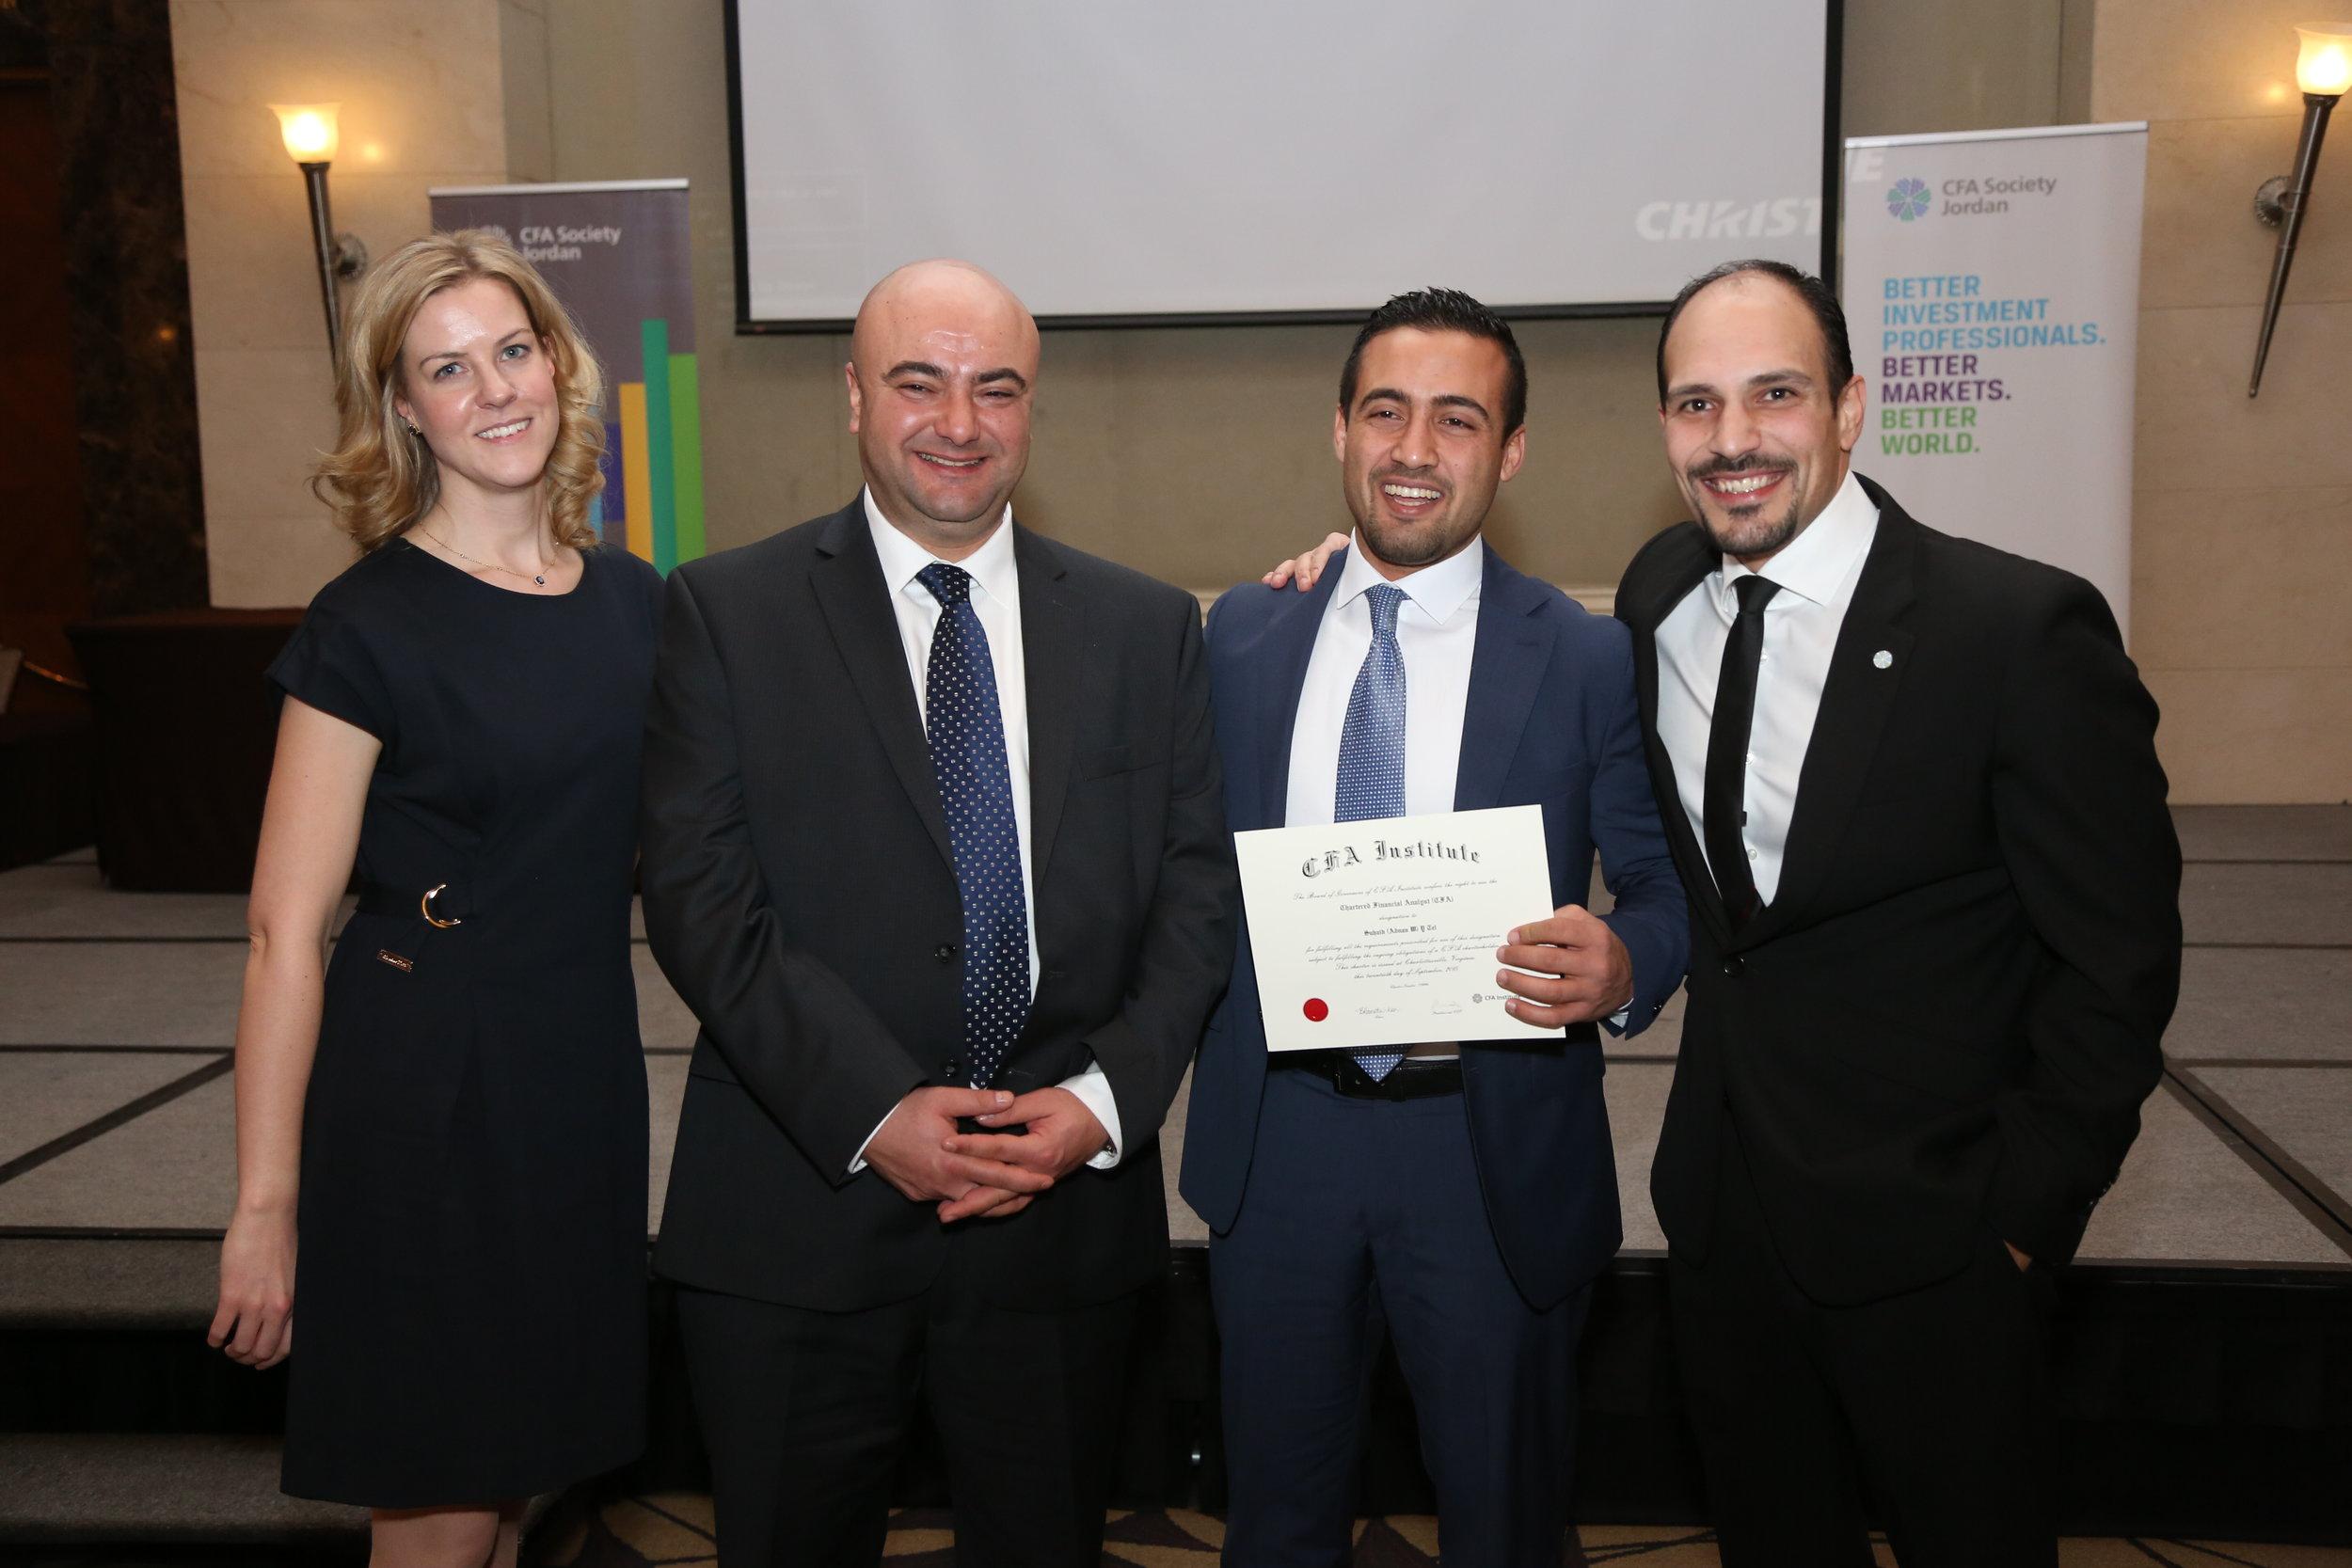 Suhaib and board members Feb 2016.jpeg